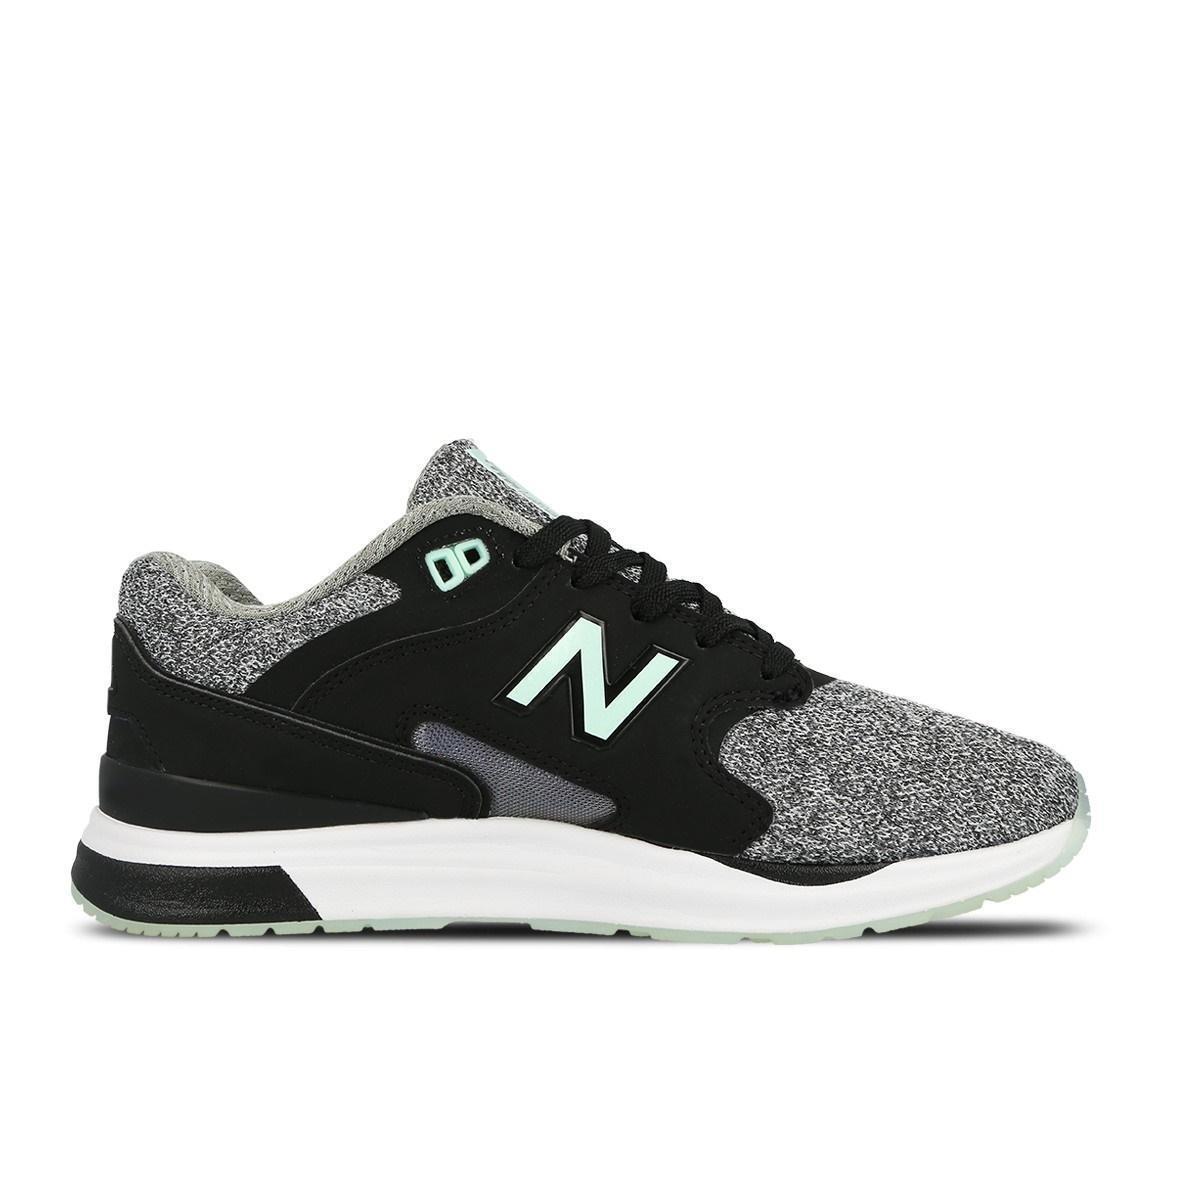 New New New balance 1550 Negro Zapatillas Para Mujer WL1550SA  tienda de bajo costo